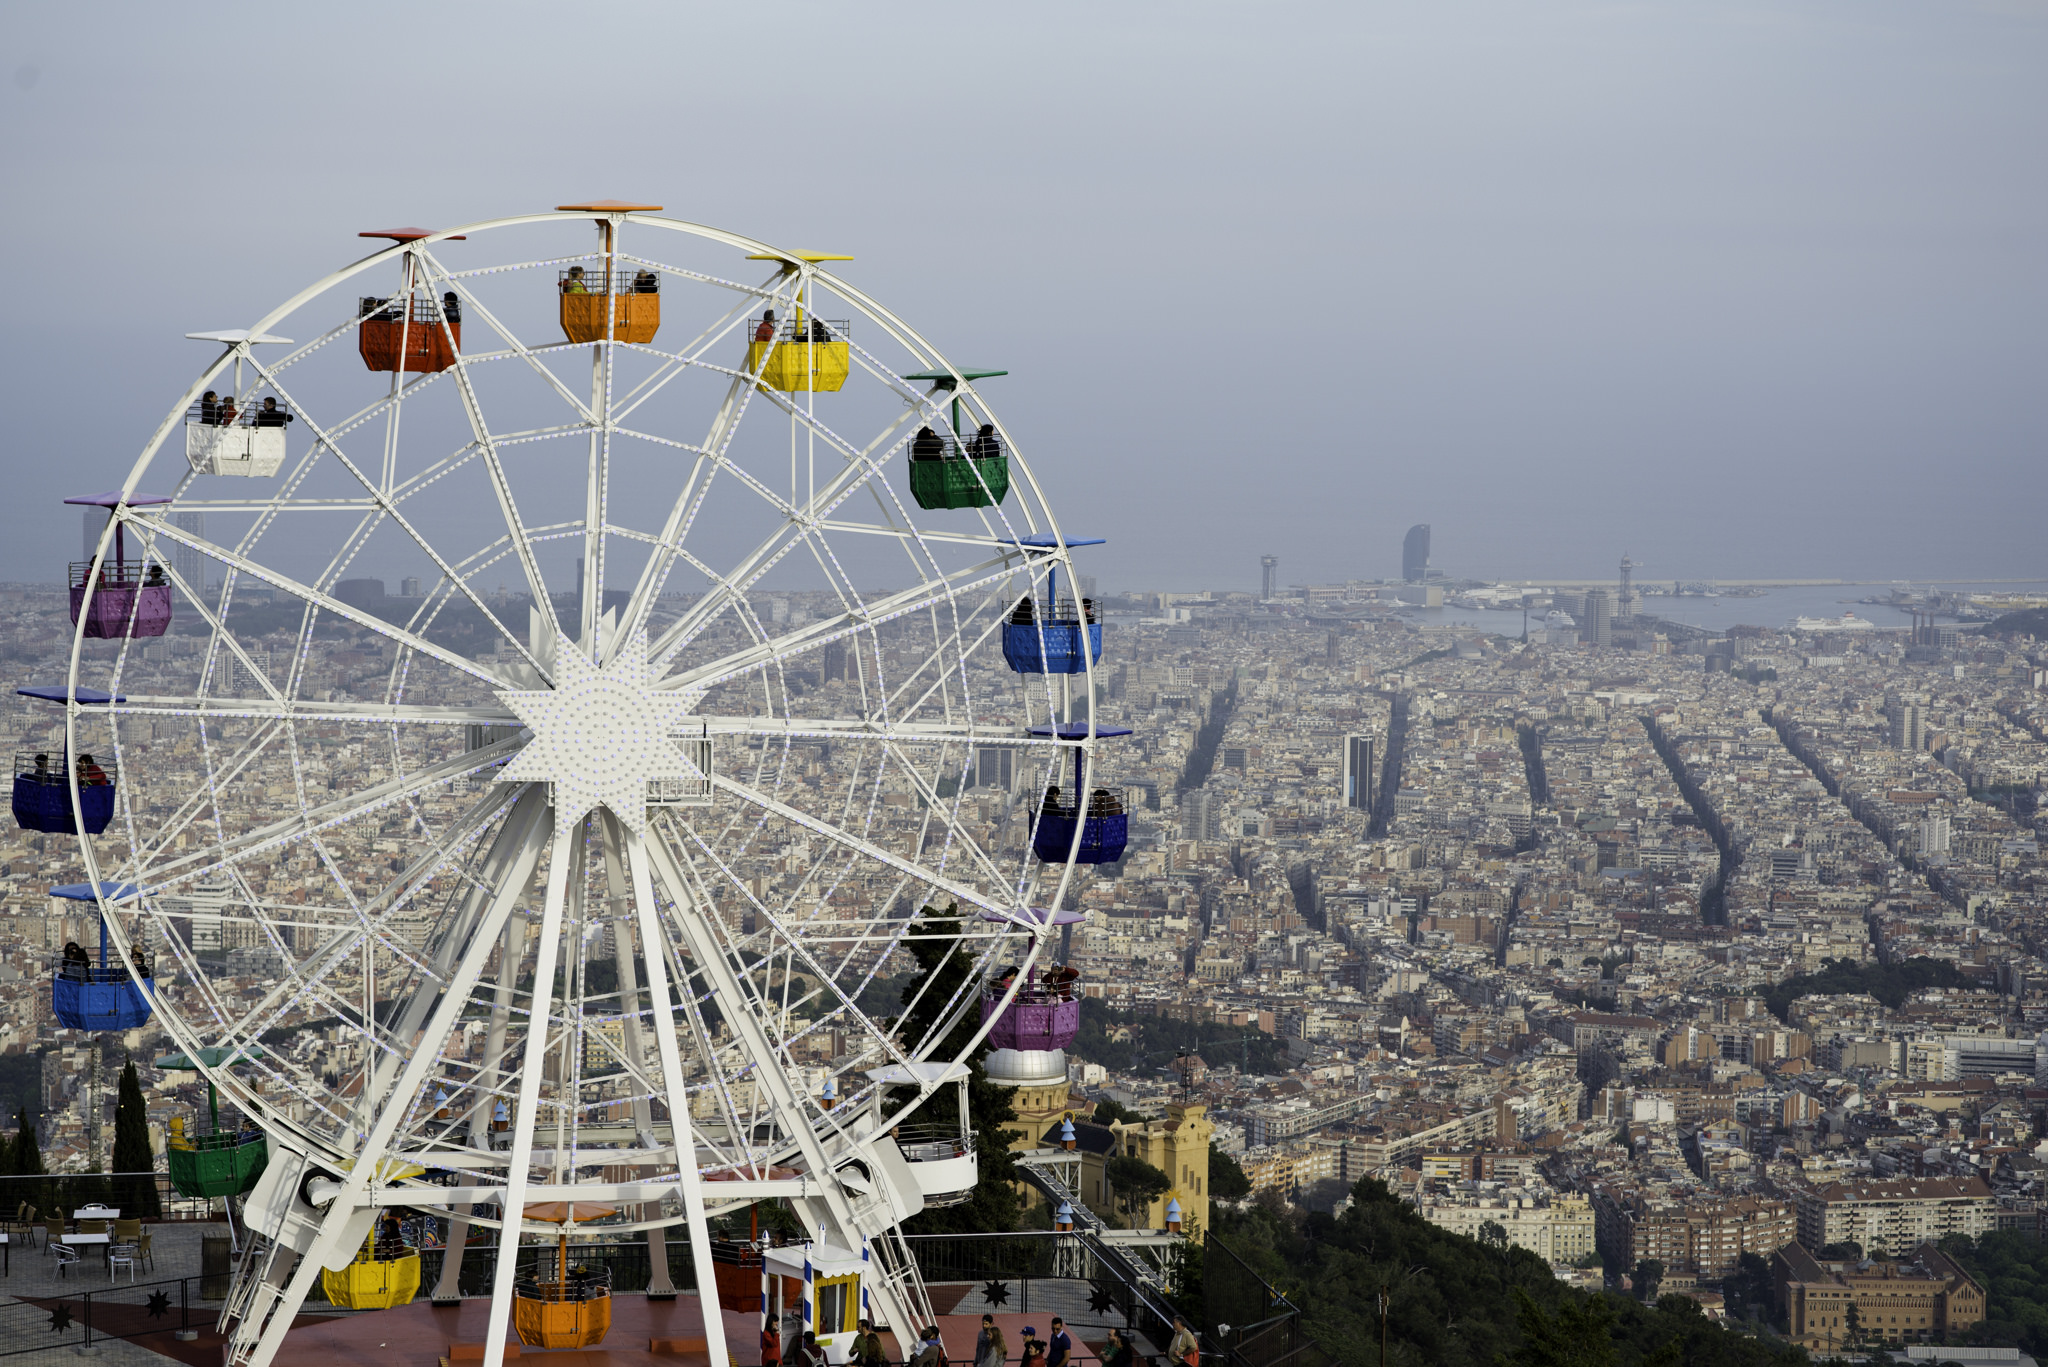 Tibidabo Amusement Park | © Jimmy Baikovicius / Flickr